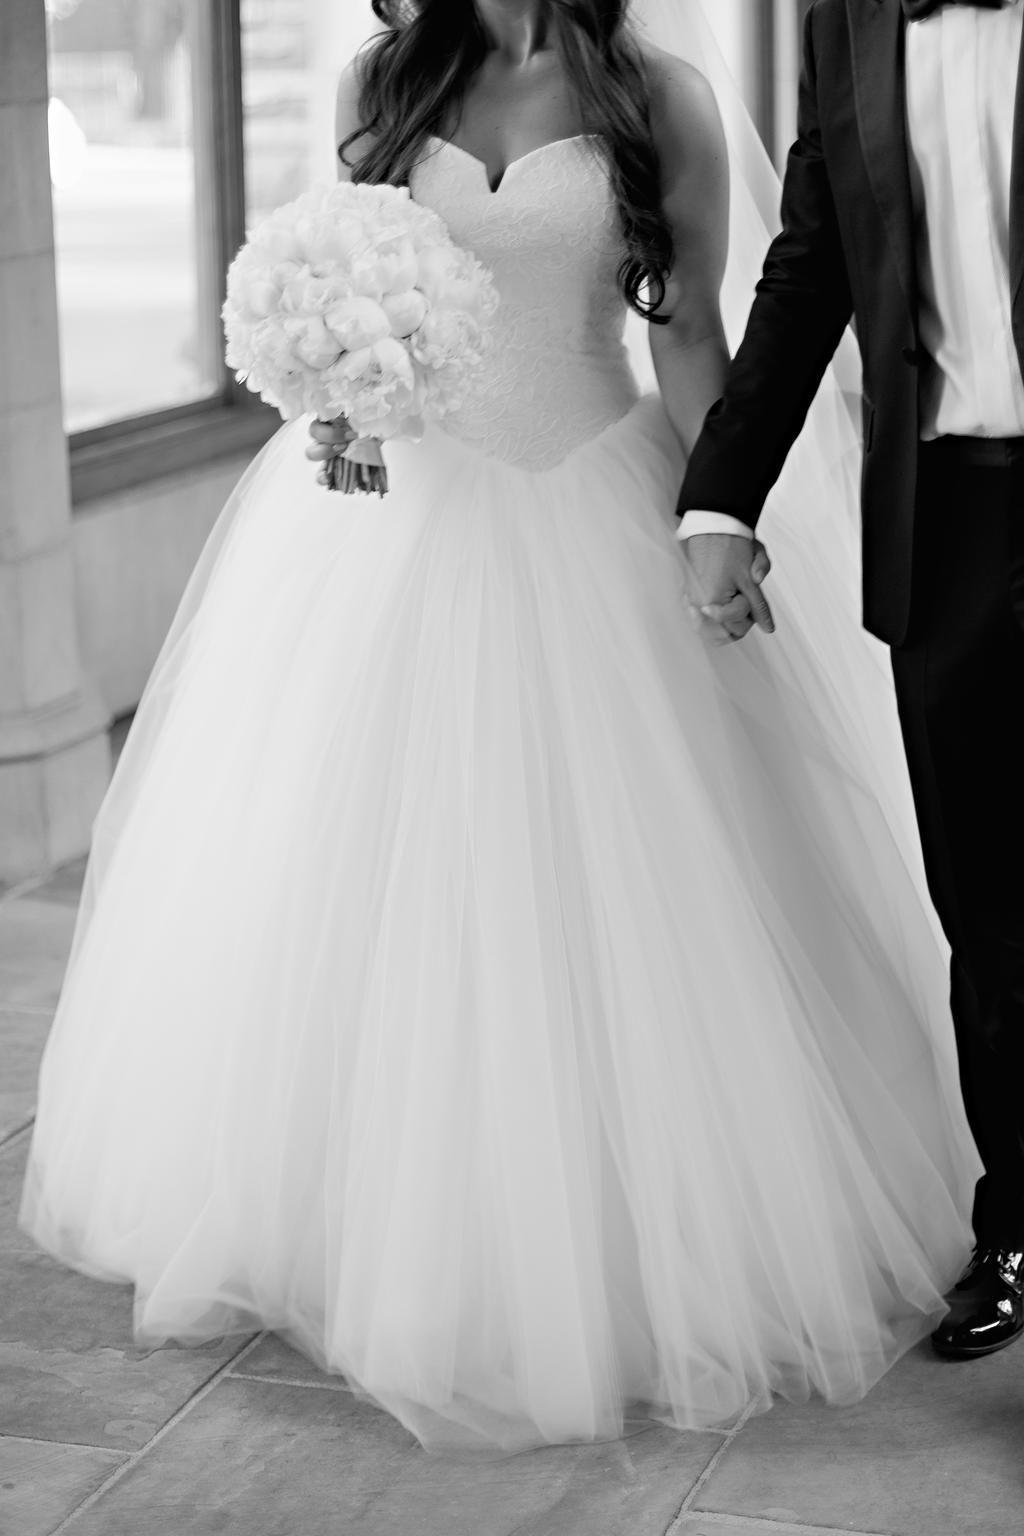 eb415d0c1f4d Vera Wang Bride Wars Wedding Dress | Used, Size: 10, $3,999 in 2019 ...